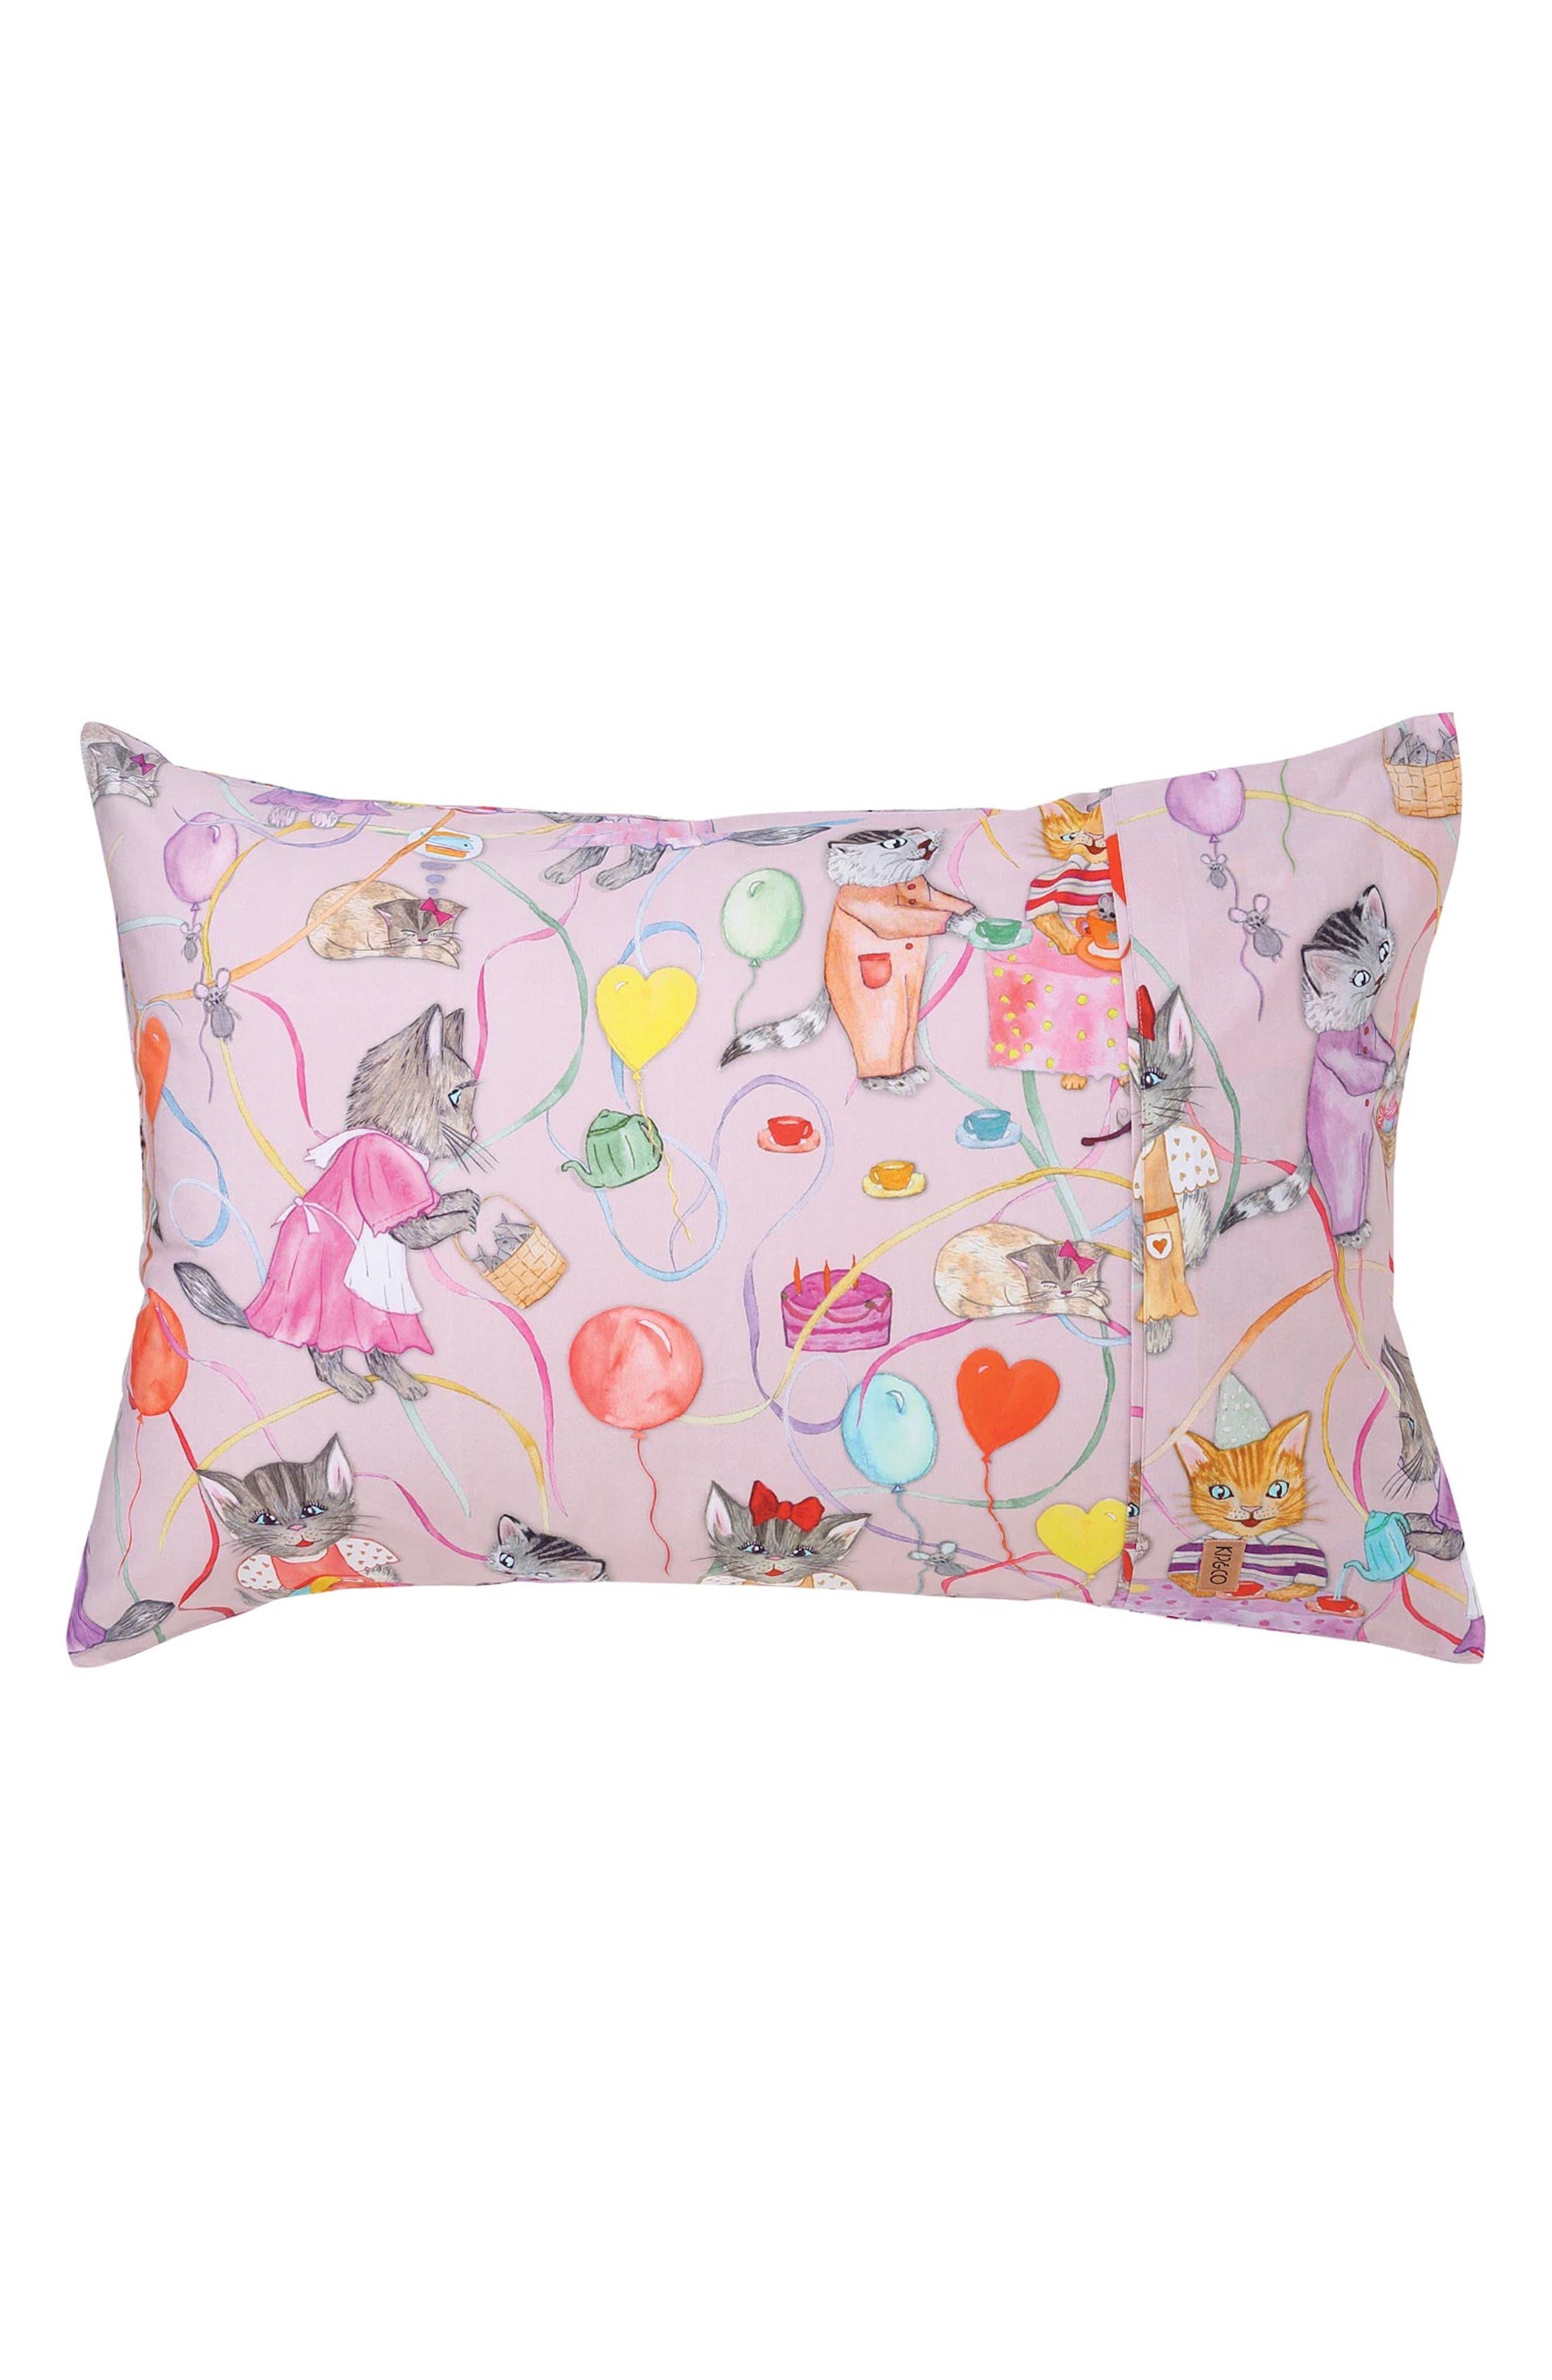 The Kitty Party Cotton Pillowcase,                             Main thumbnail 1, color,                             650